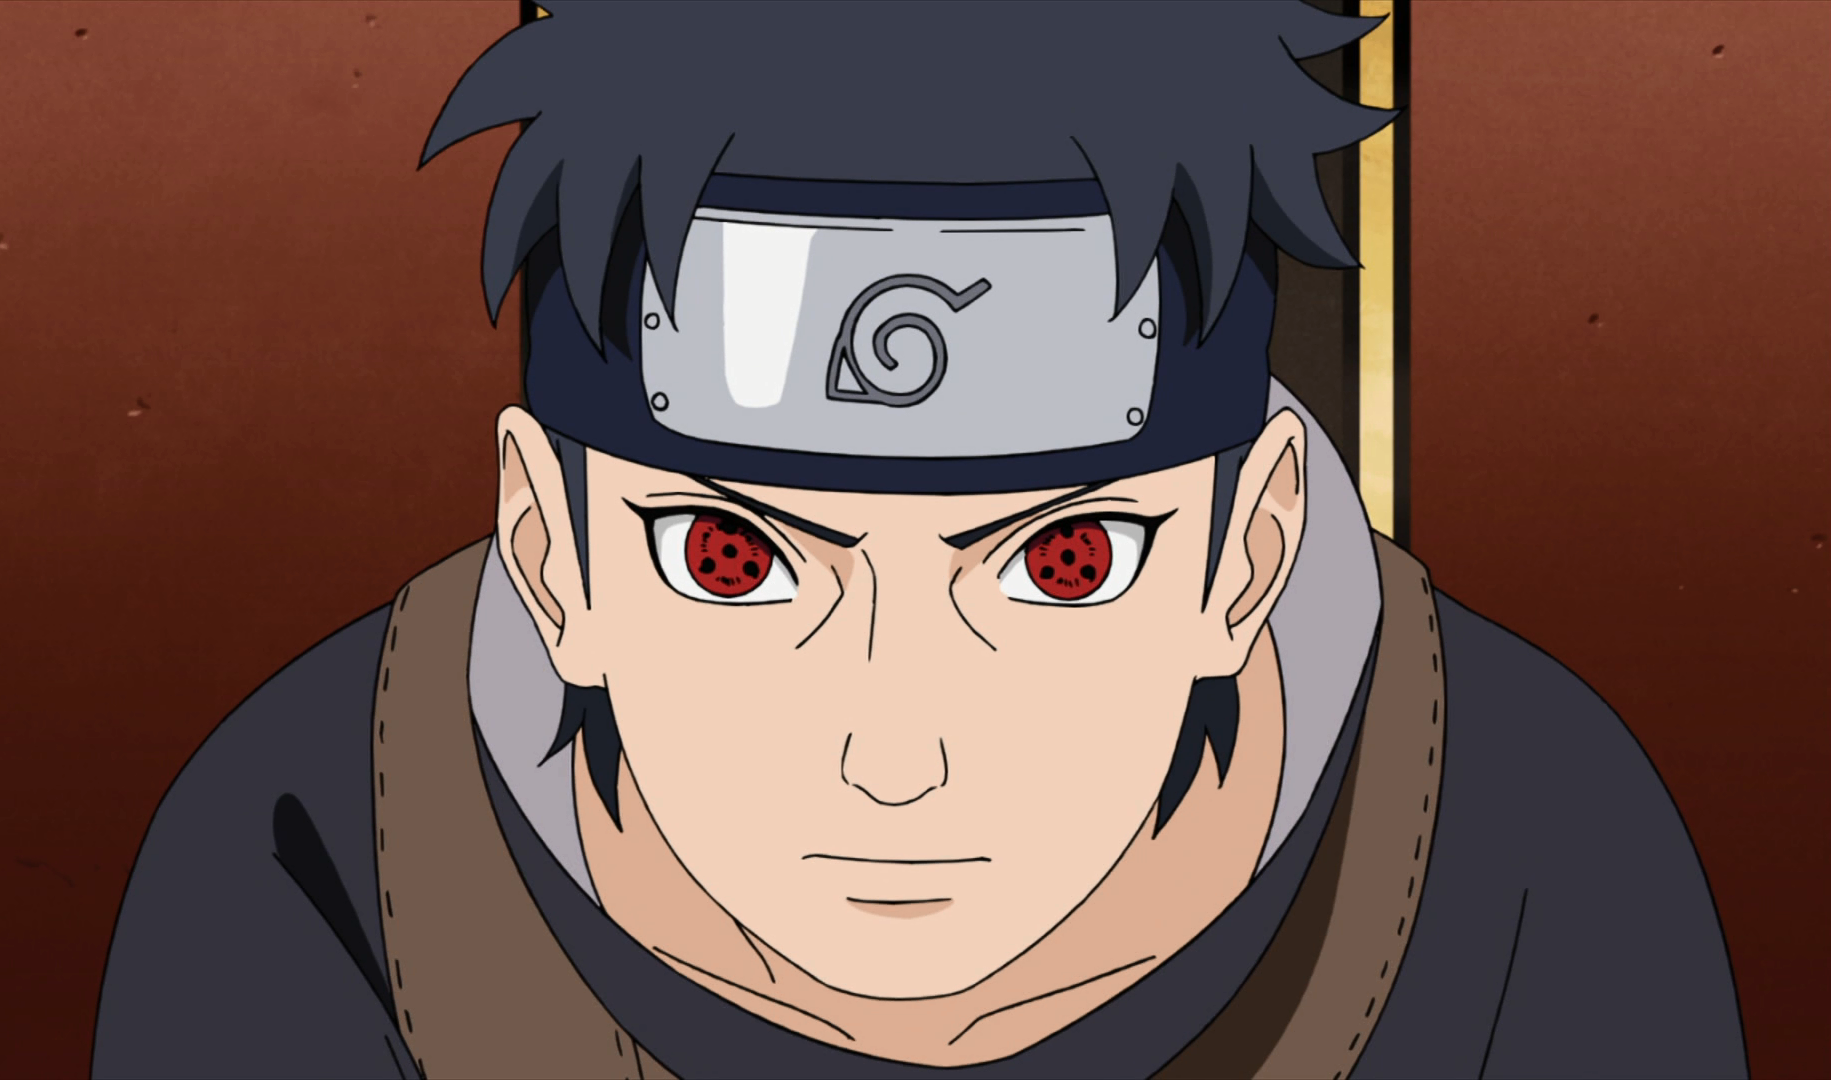 Shisui Uchiha (Waterkai) | Naruto Fanon Wiki | FANDOM powered by Wikia